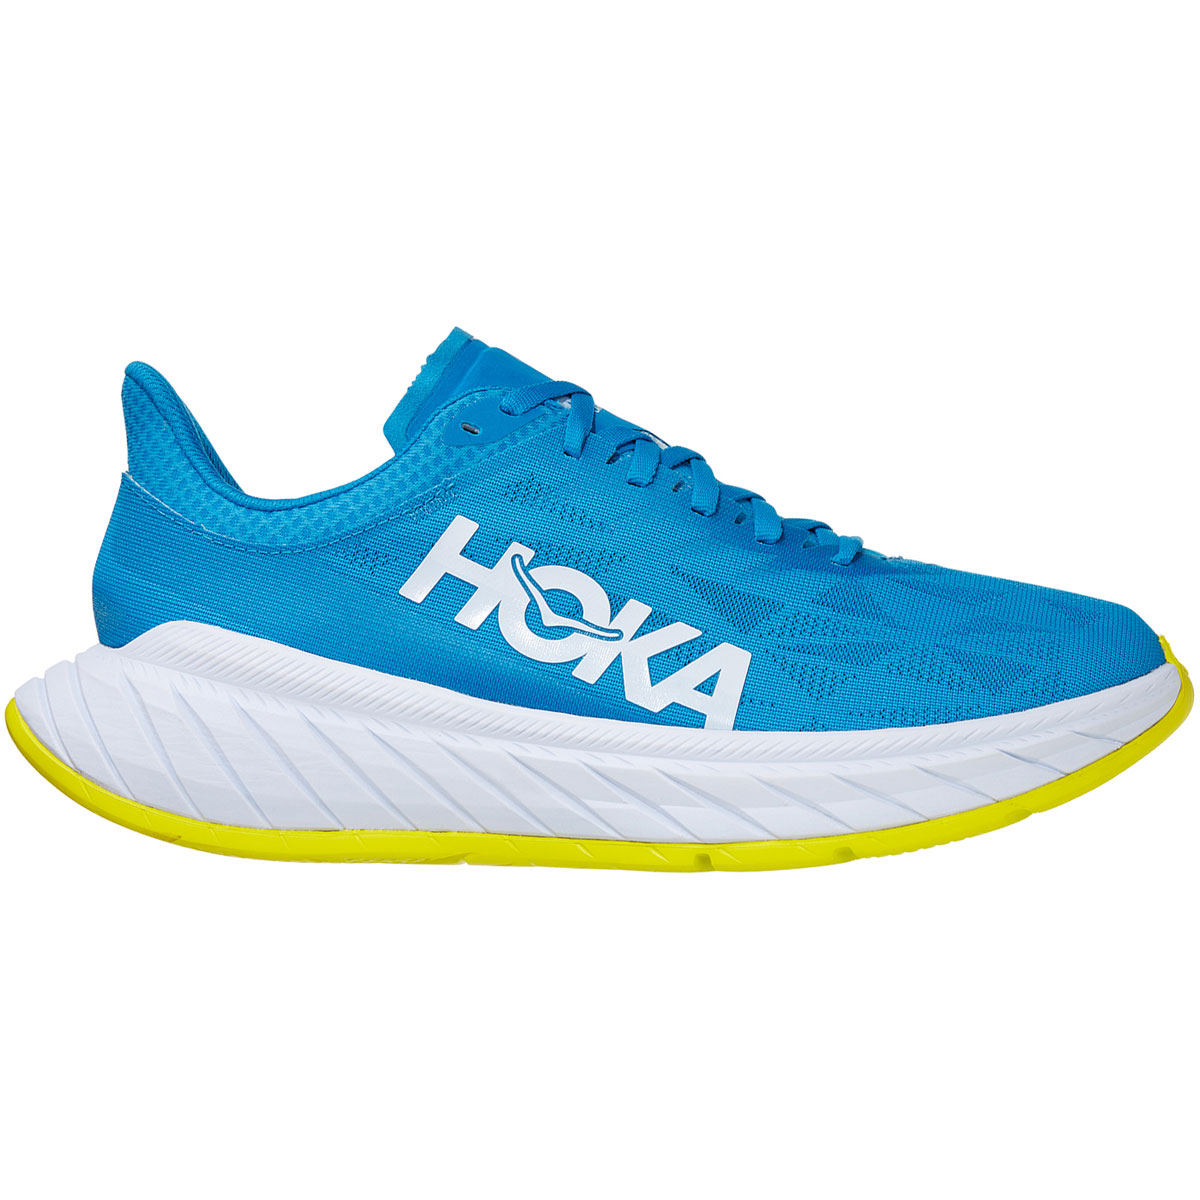 Men's Hoka One One Carbon X 2 Running Shoe - Color: Diva Blue/Citron - Size: 7 - Width: Regular, Diva Blue/Citron, large, image 1